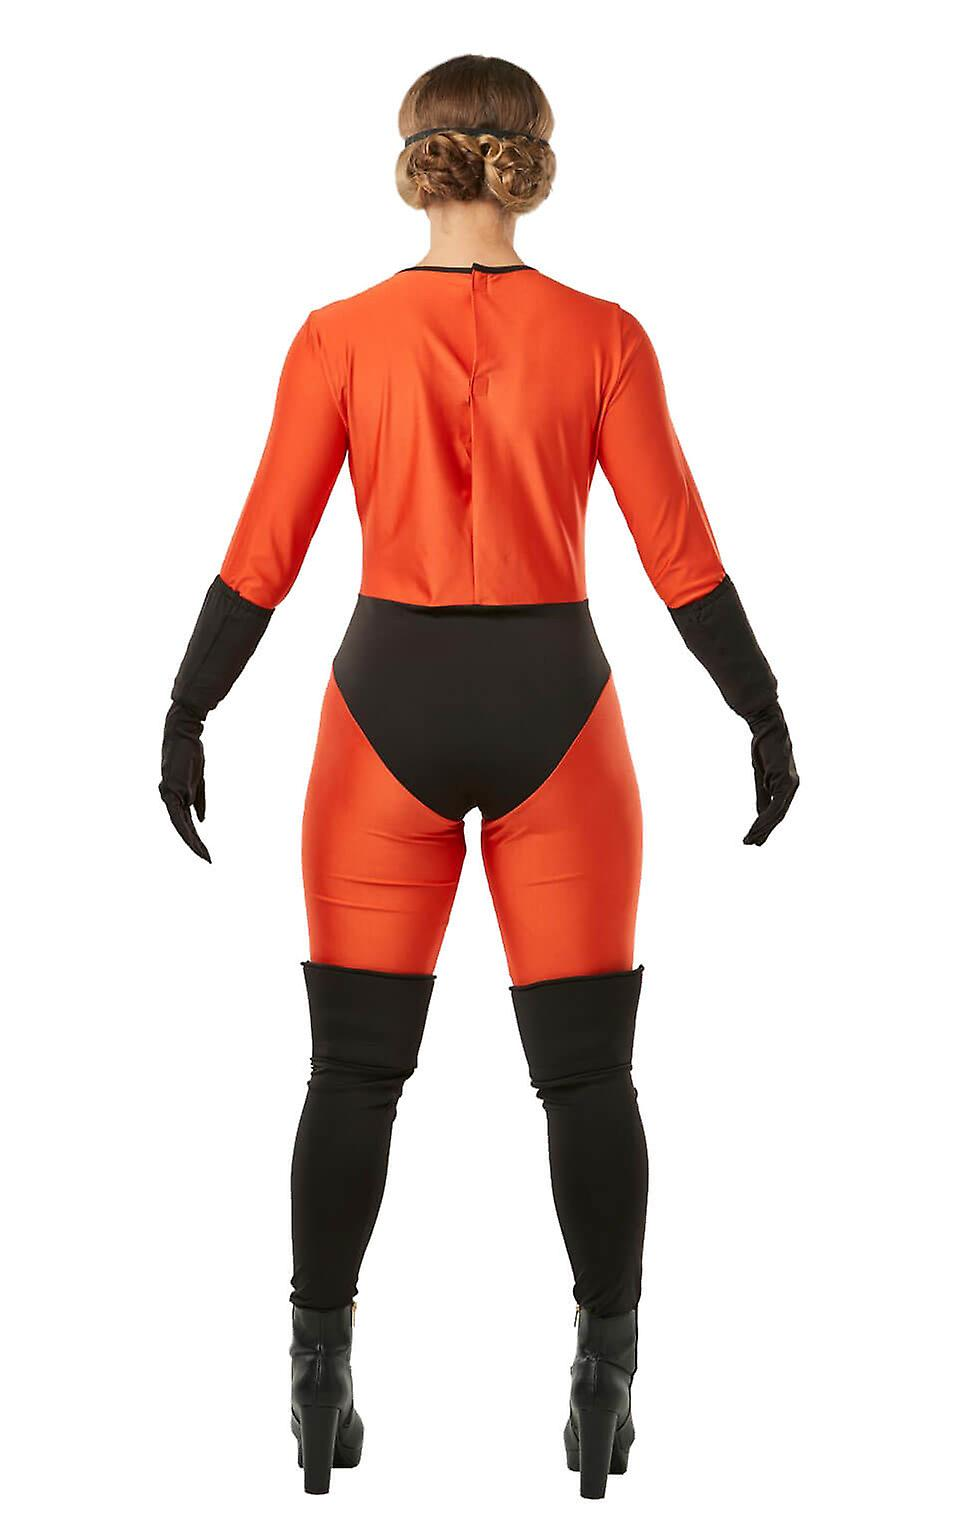 Adult Mrs Incredible Costume- Incredibles